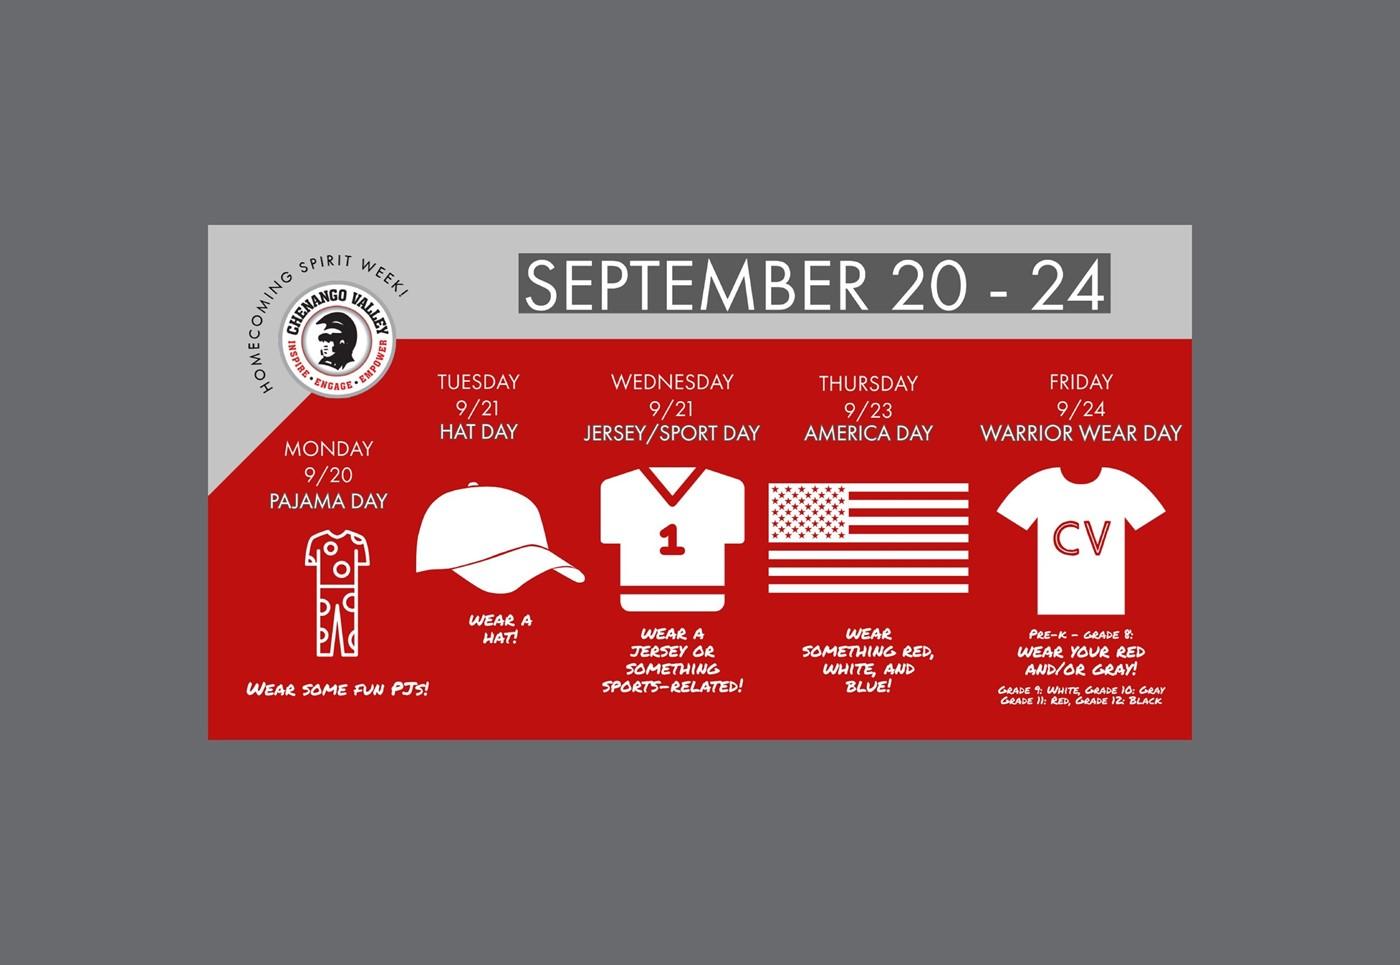 Spirit Week September 20 - 24